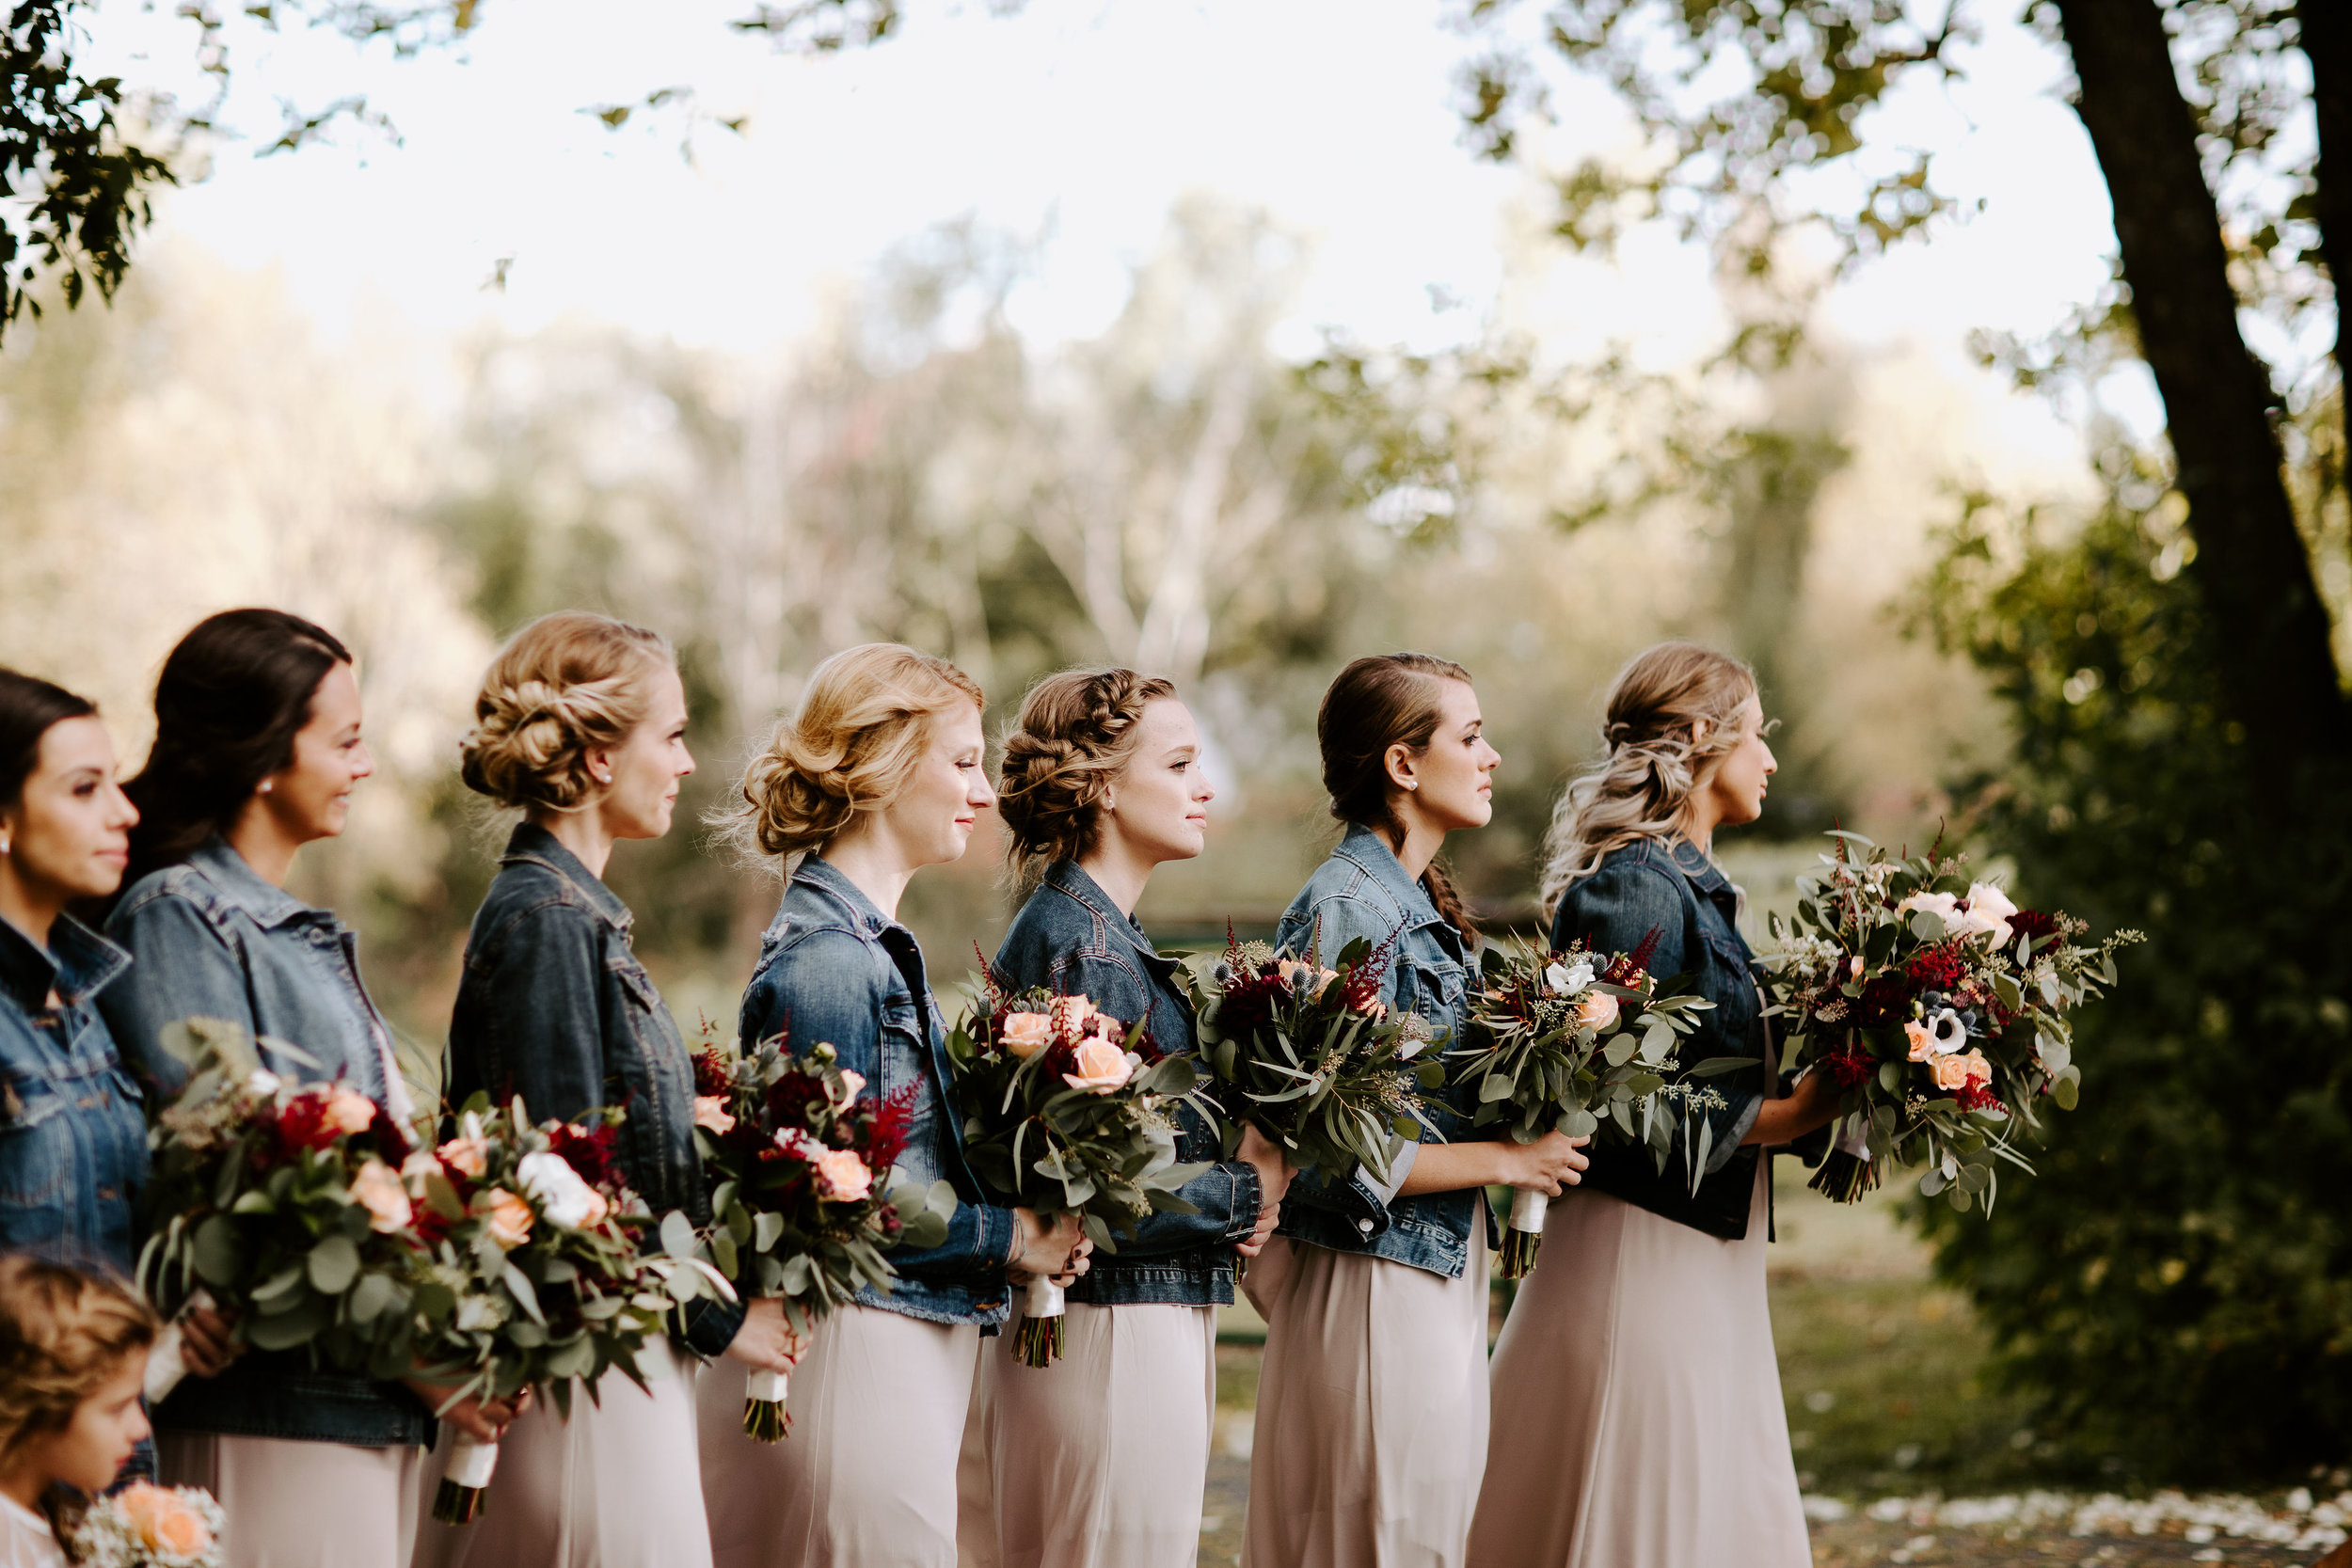 Bridesmaids-Ceremony.jpg